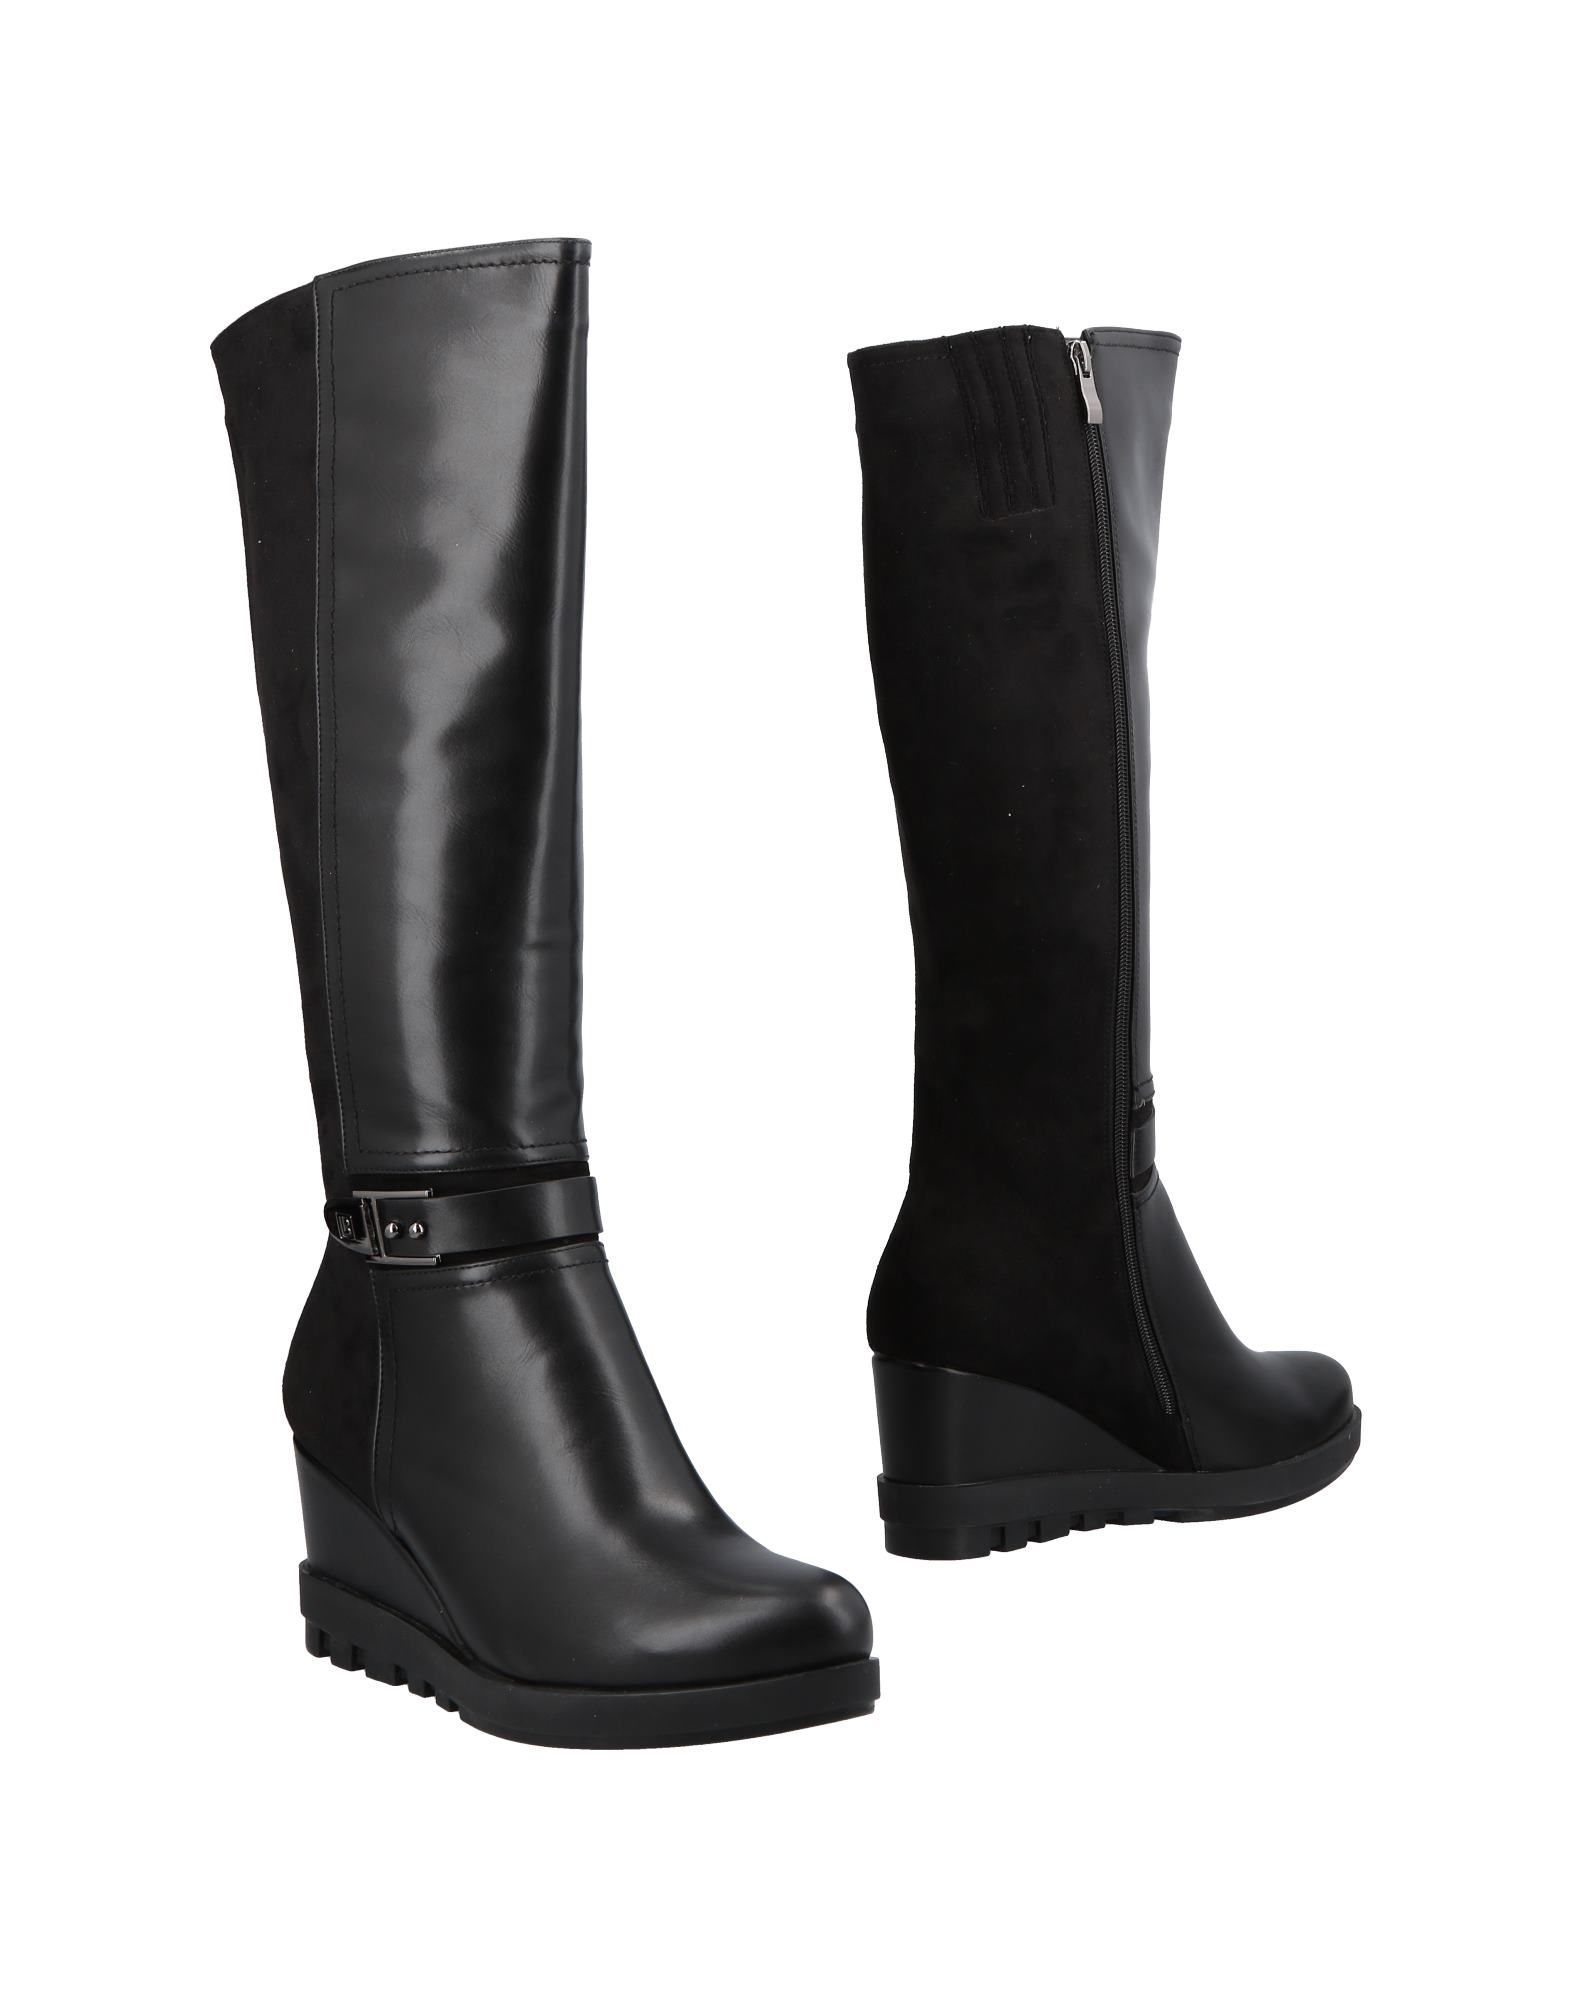 Laura Biagiotti Stiefel Damen beliebte  11504428PS Gute Qualität beliebte Damen Schuhe 4d2456